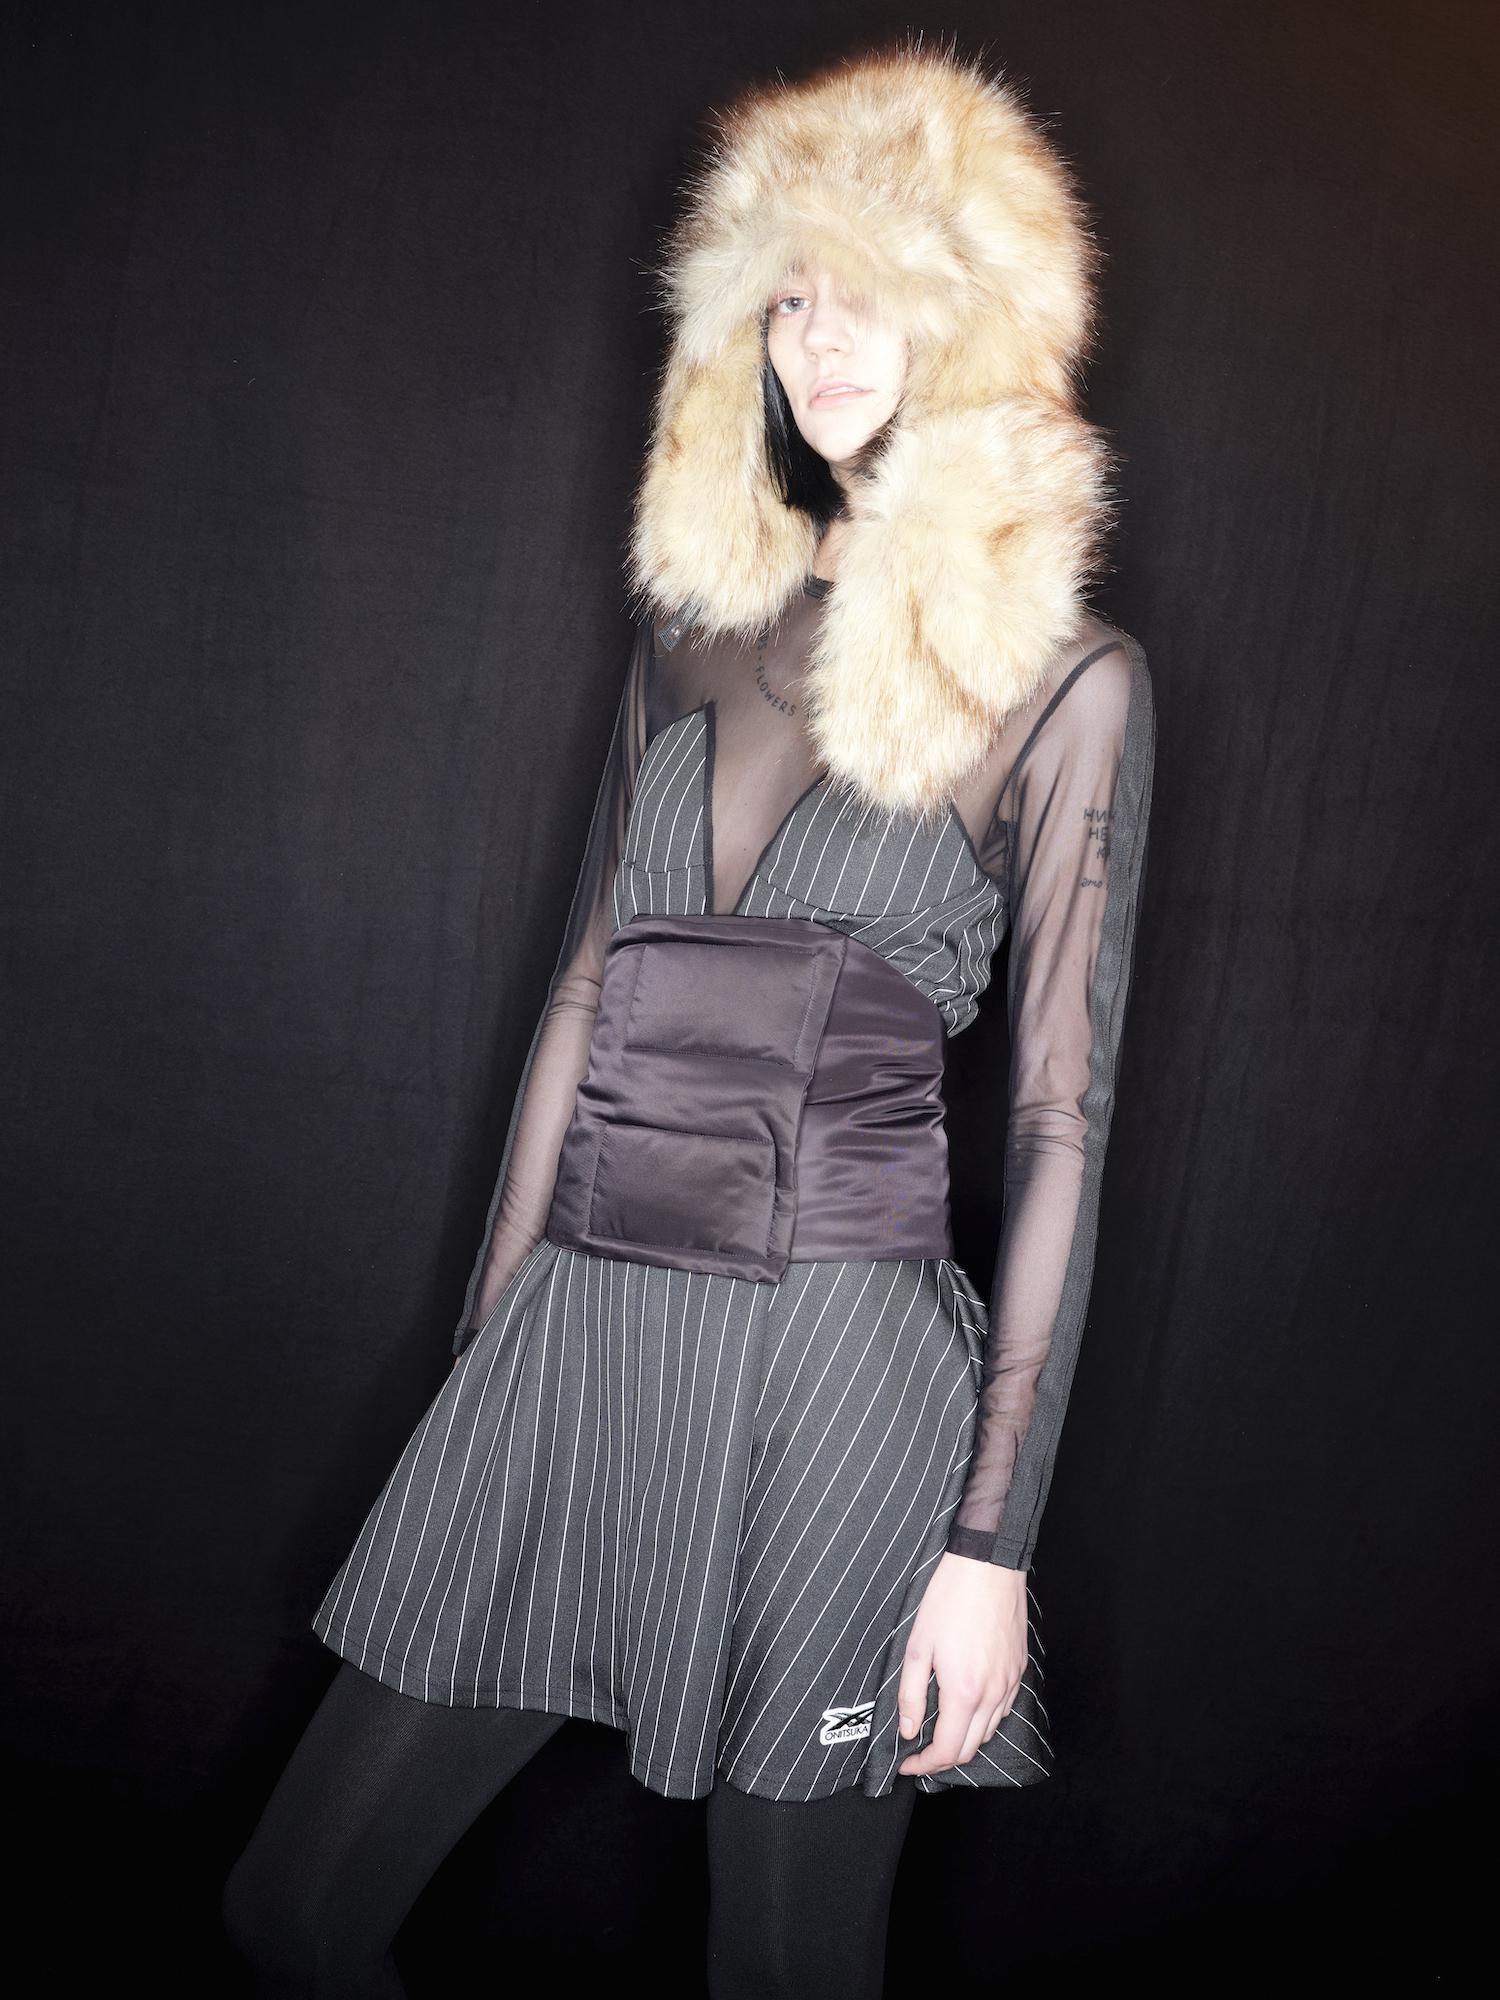 Onitsuka Tiger Autumn _ Winter 2021 collection_Milan Fashion Show_22.jpg